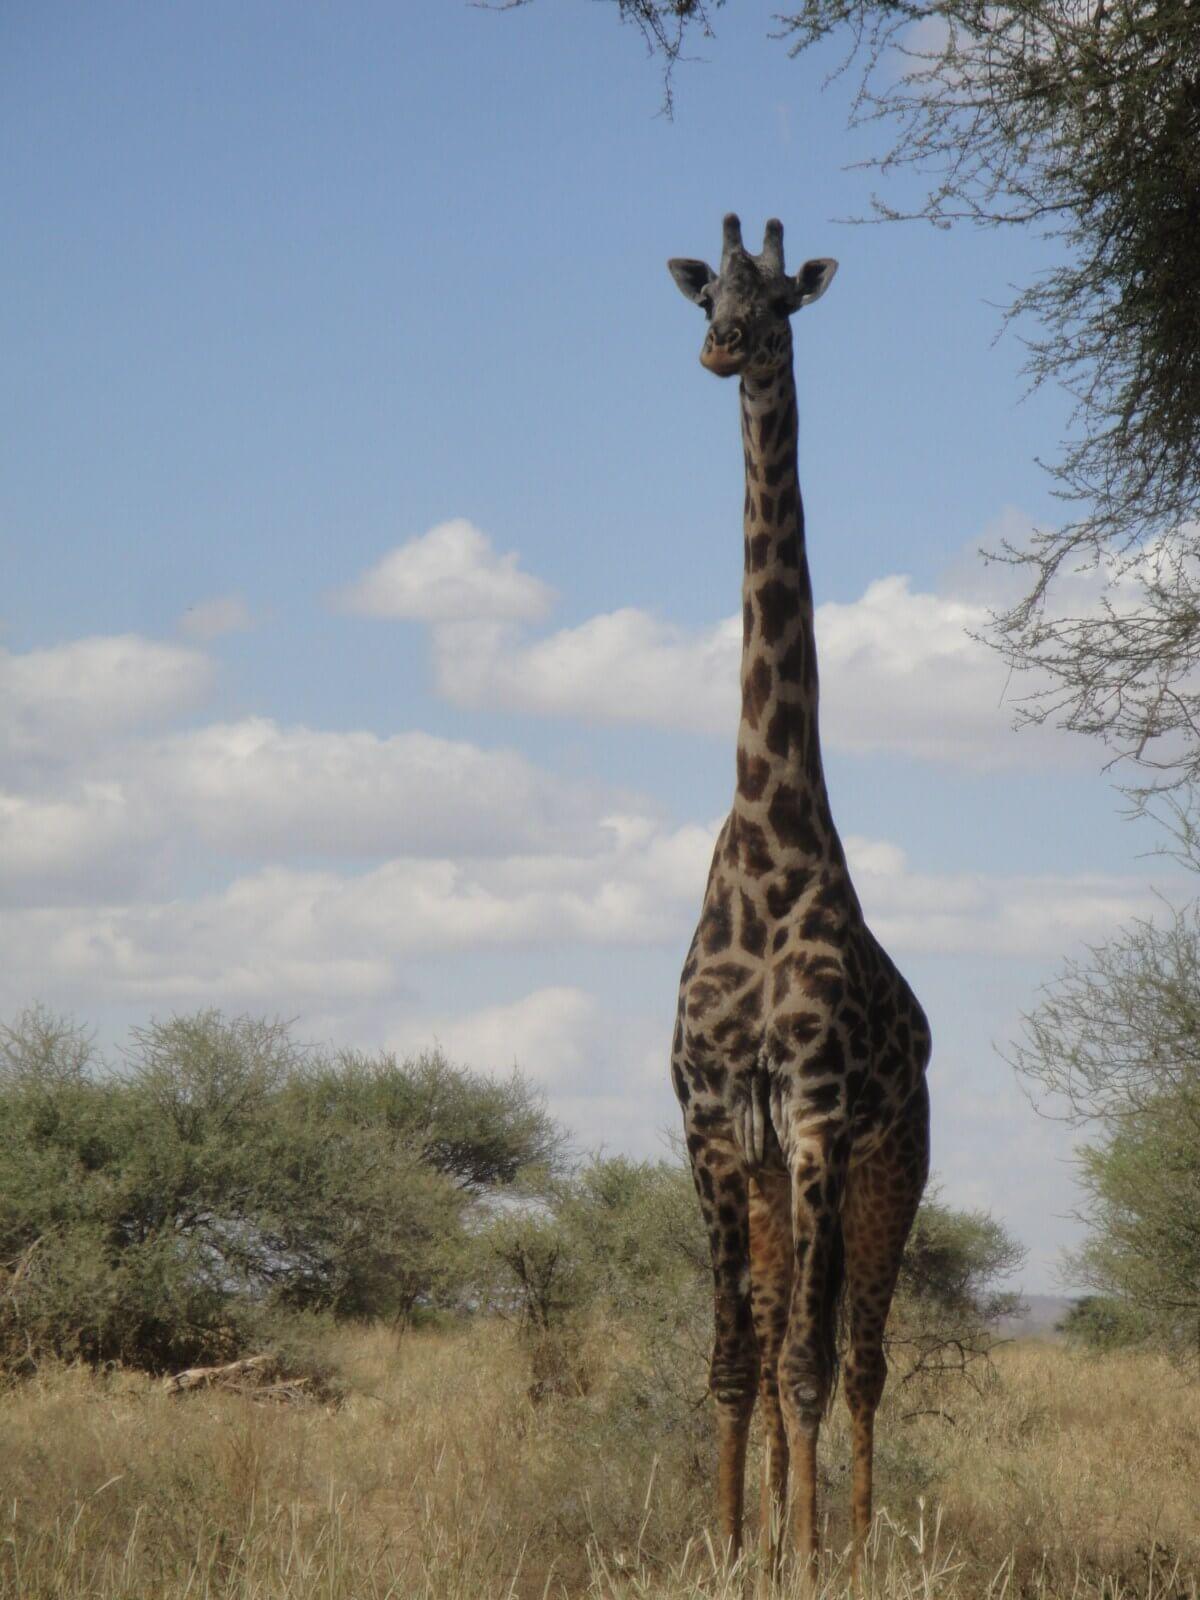 Giraffe in Ngorongoro Crater Tanzania